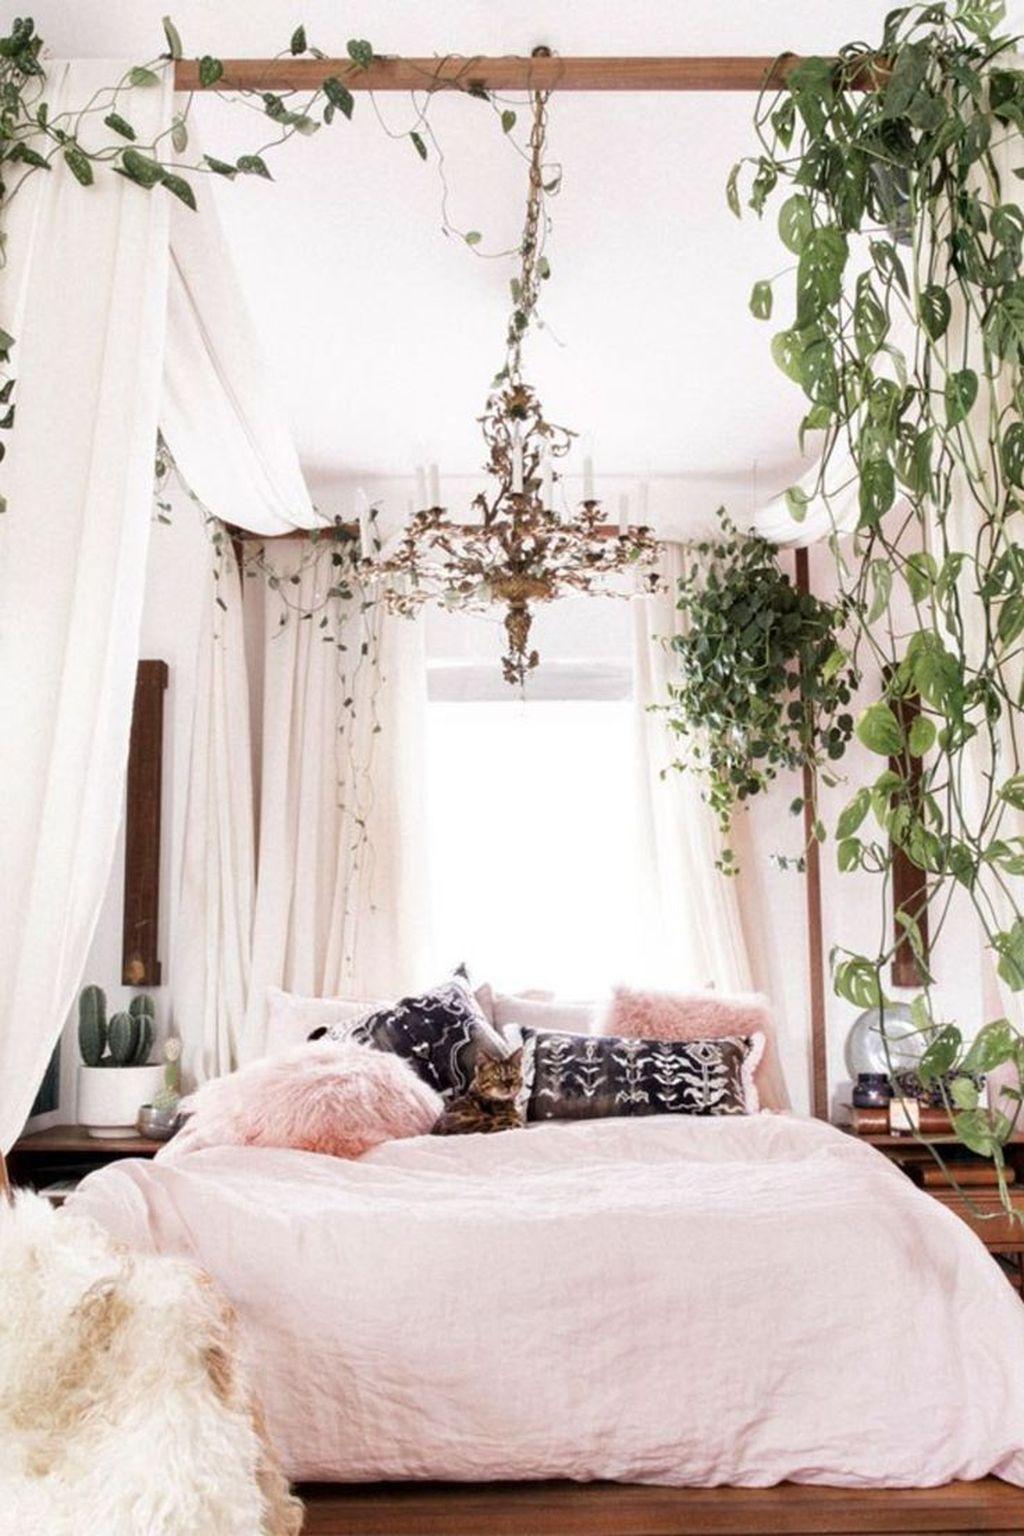 Awesome Boho Chic Bedroom Decor Ideas 17